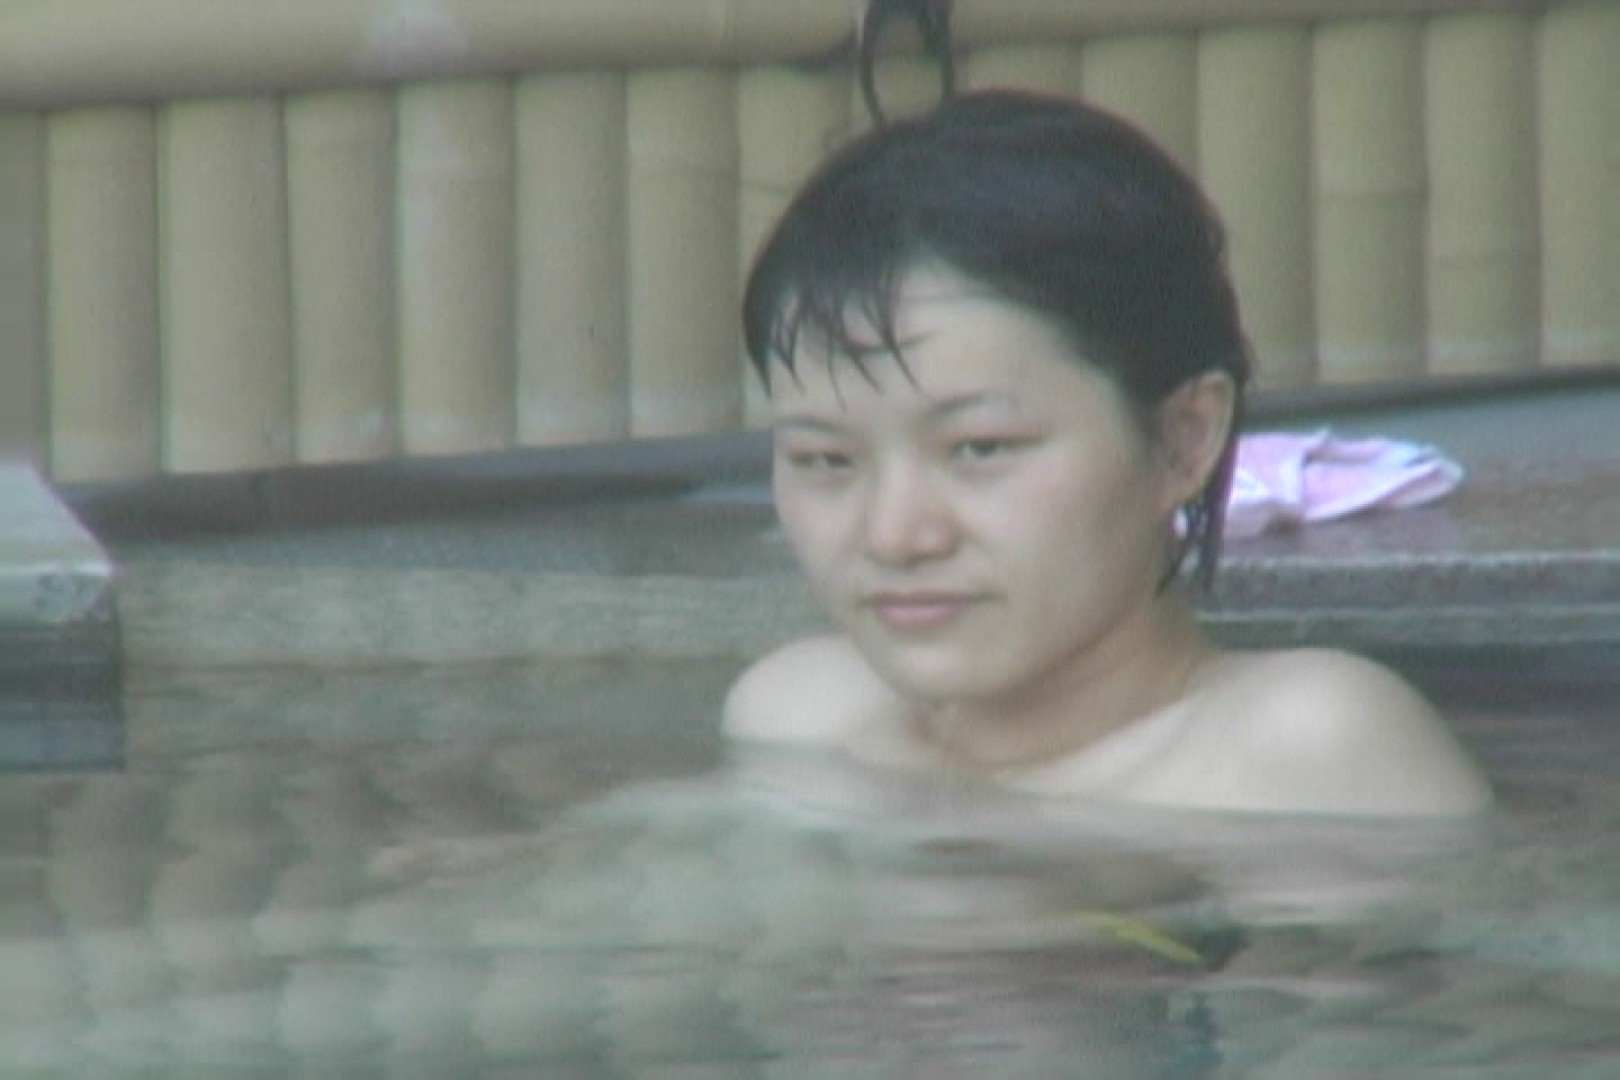 Aquaな露天風呂Vol.116 露天風呂編  107PIX 76